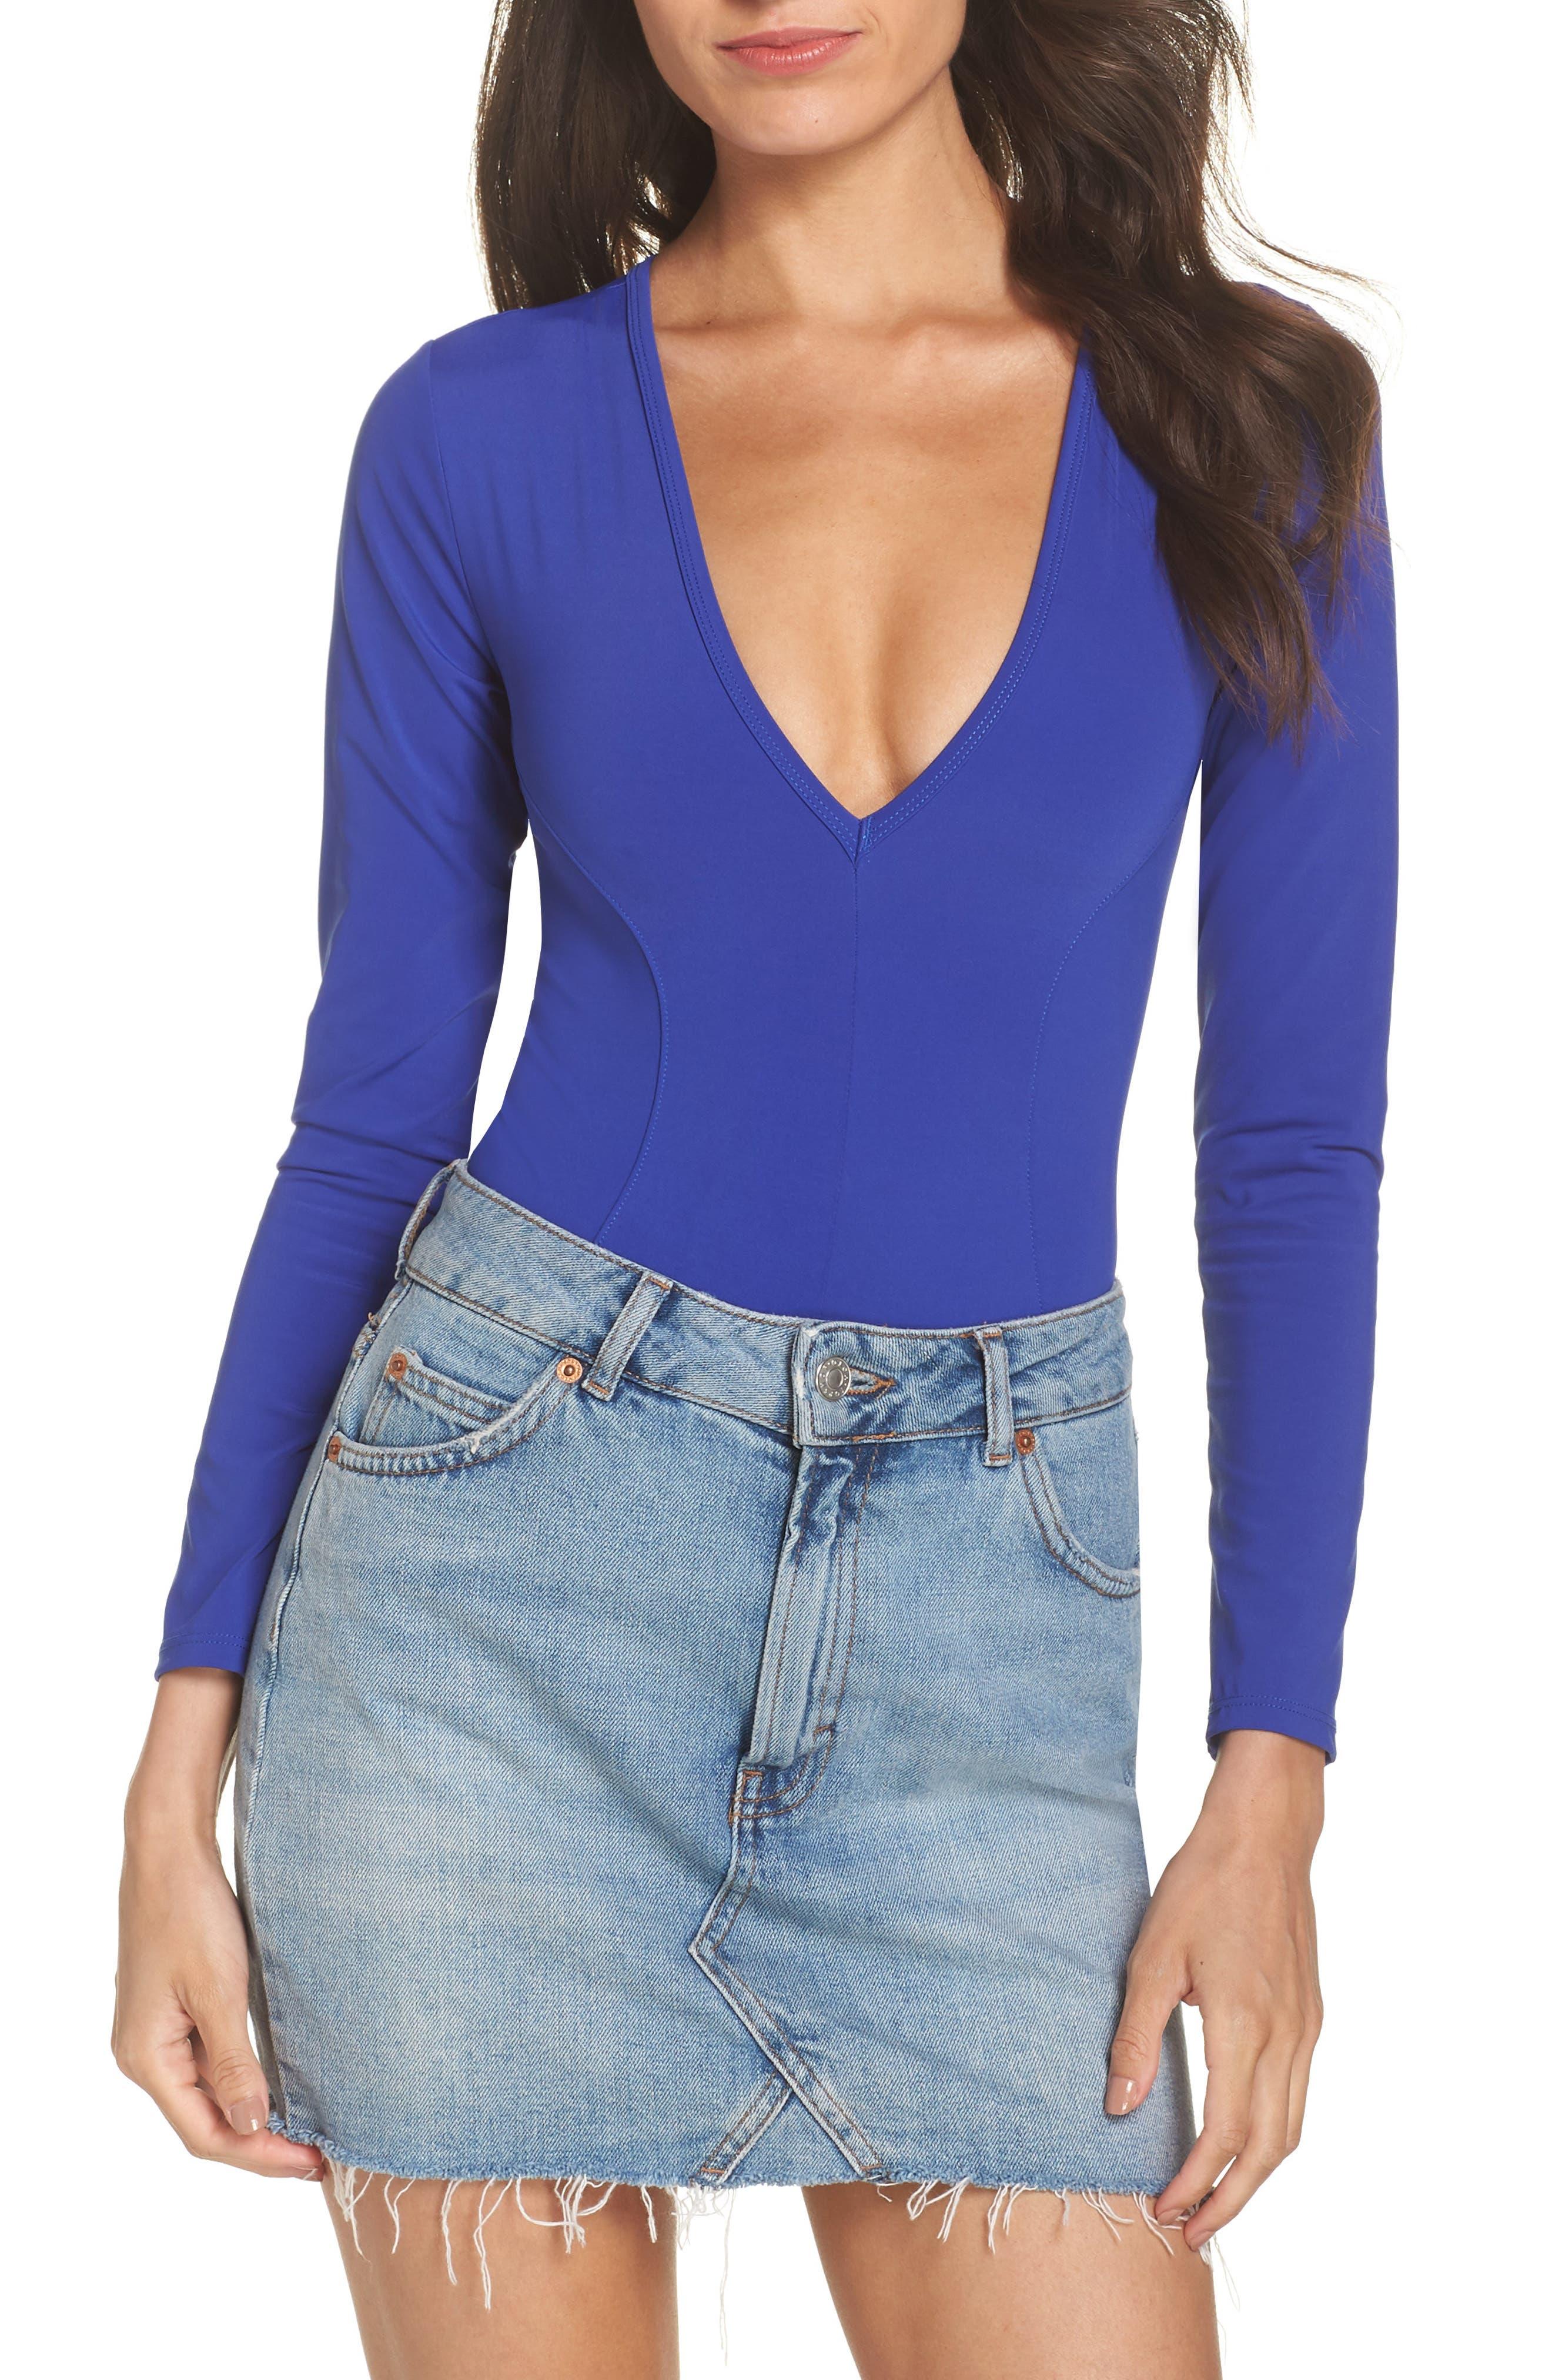 Intimately FP Thong Bodysuit,                             Alternate thumbnail 2, color,                             BLUE